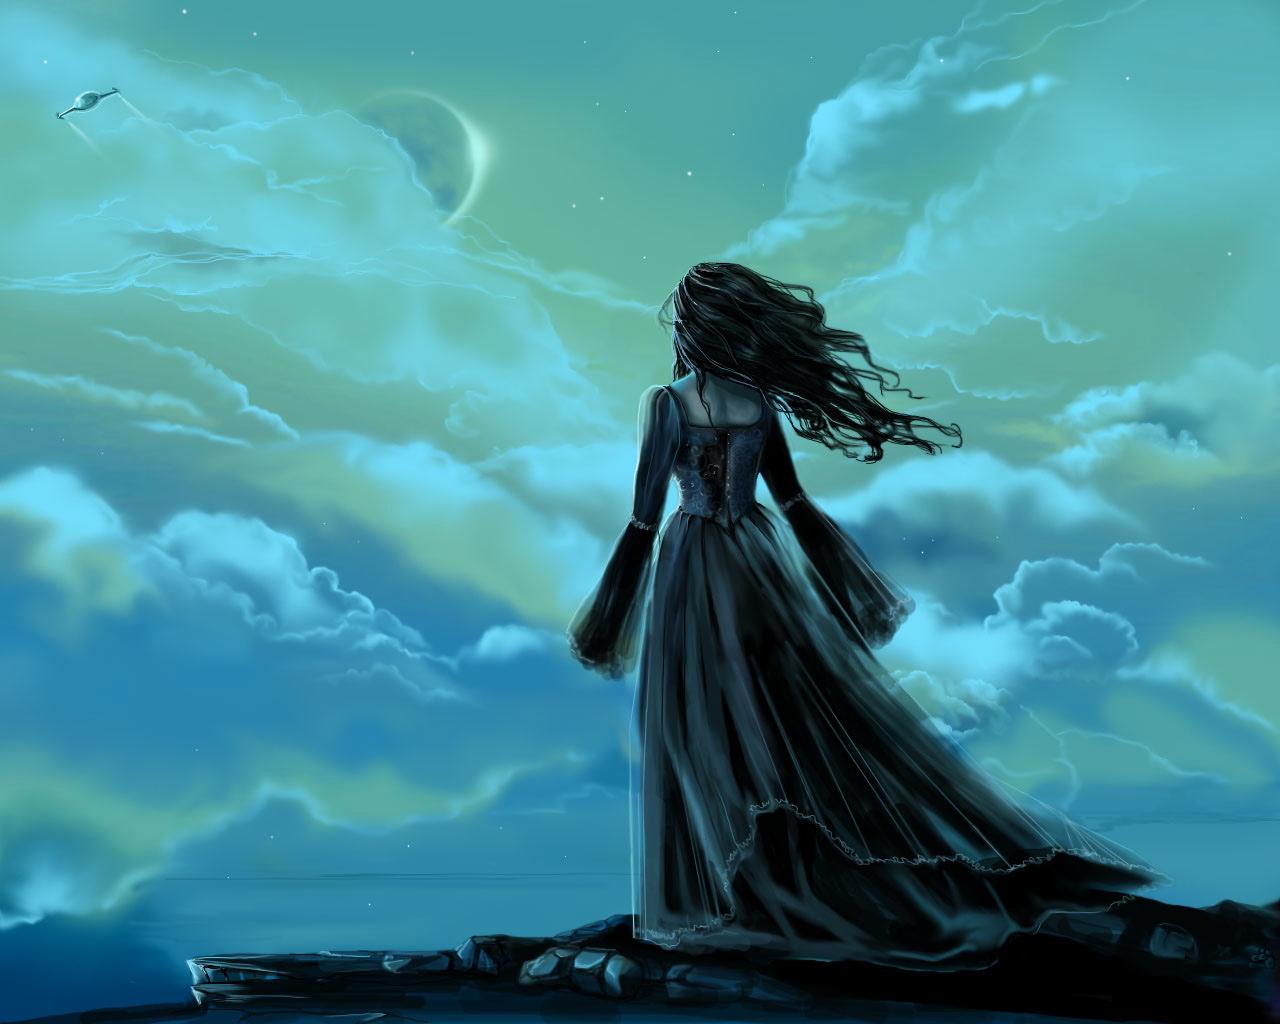 Beautiful Wallpapers For Desktop Beautiful Night of Sky Wallpapers 1280x1024